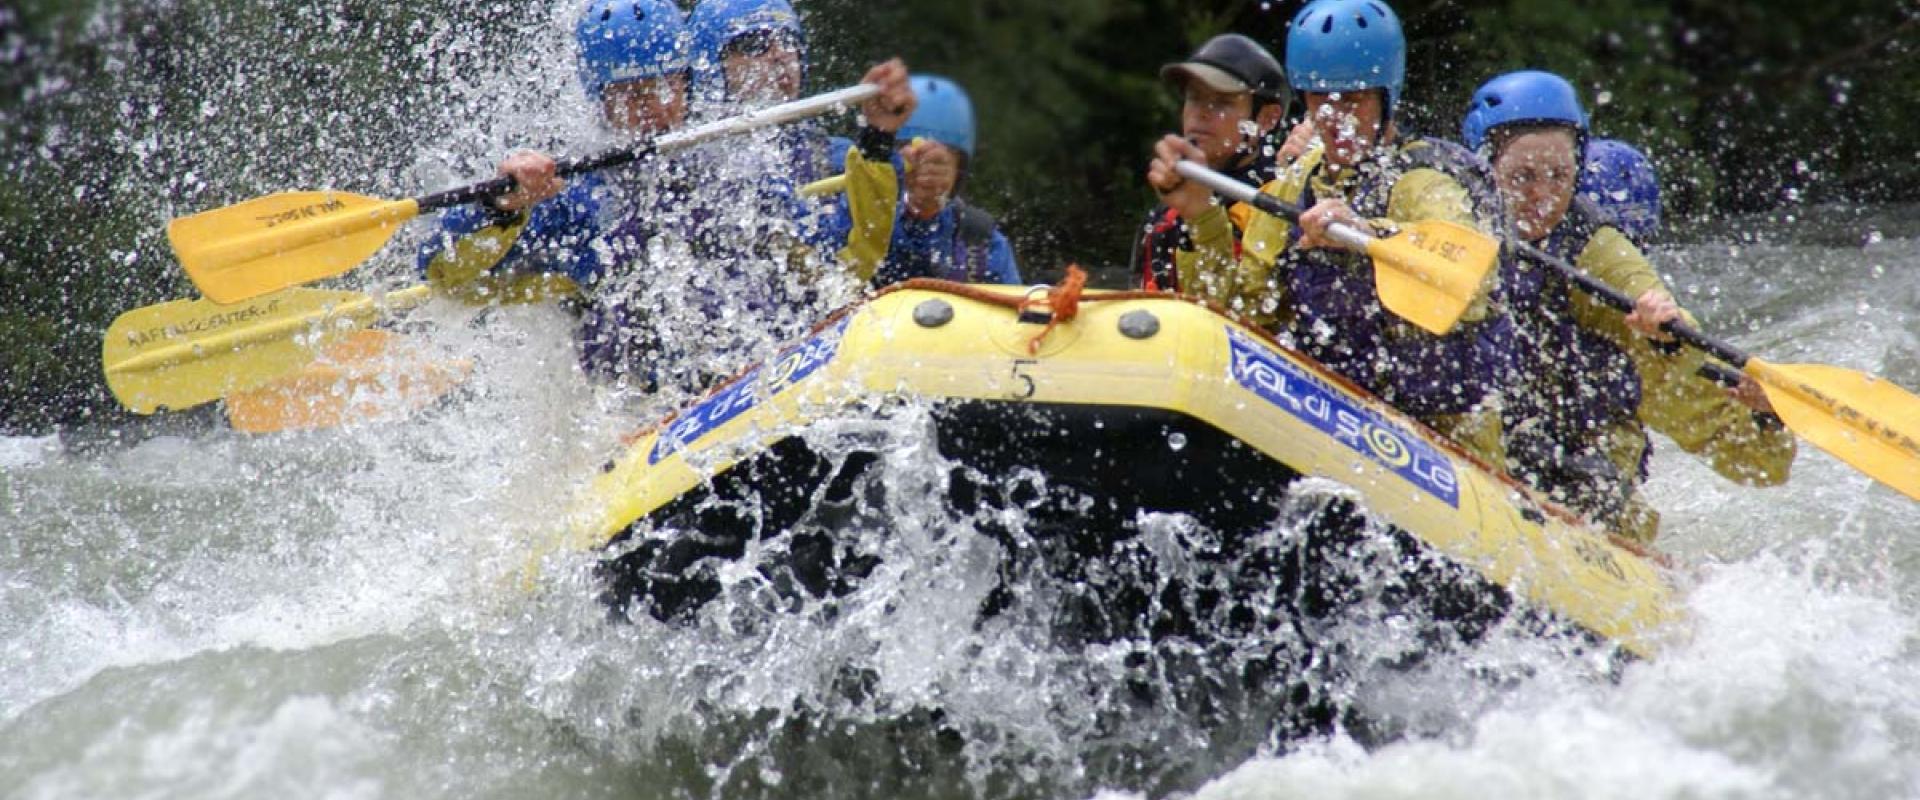 rafting on the river Vara